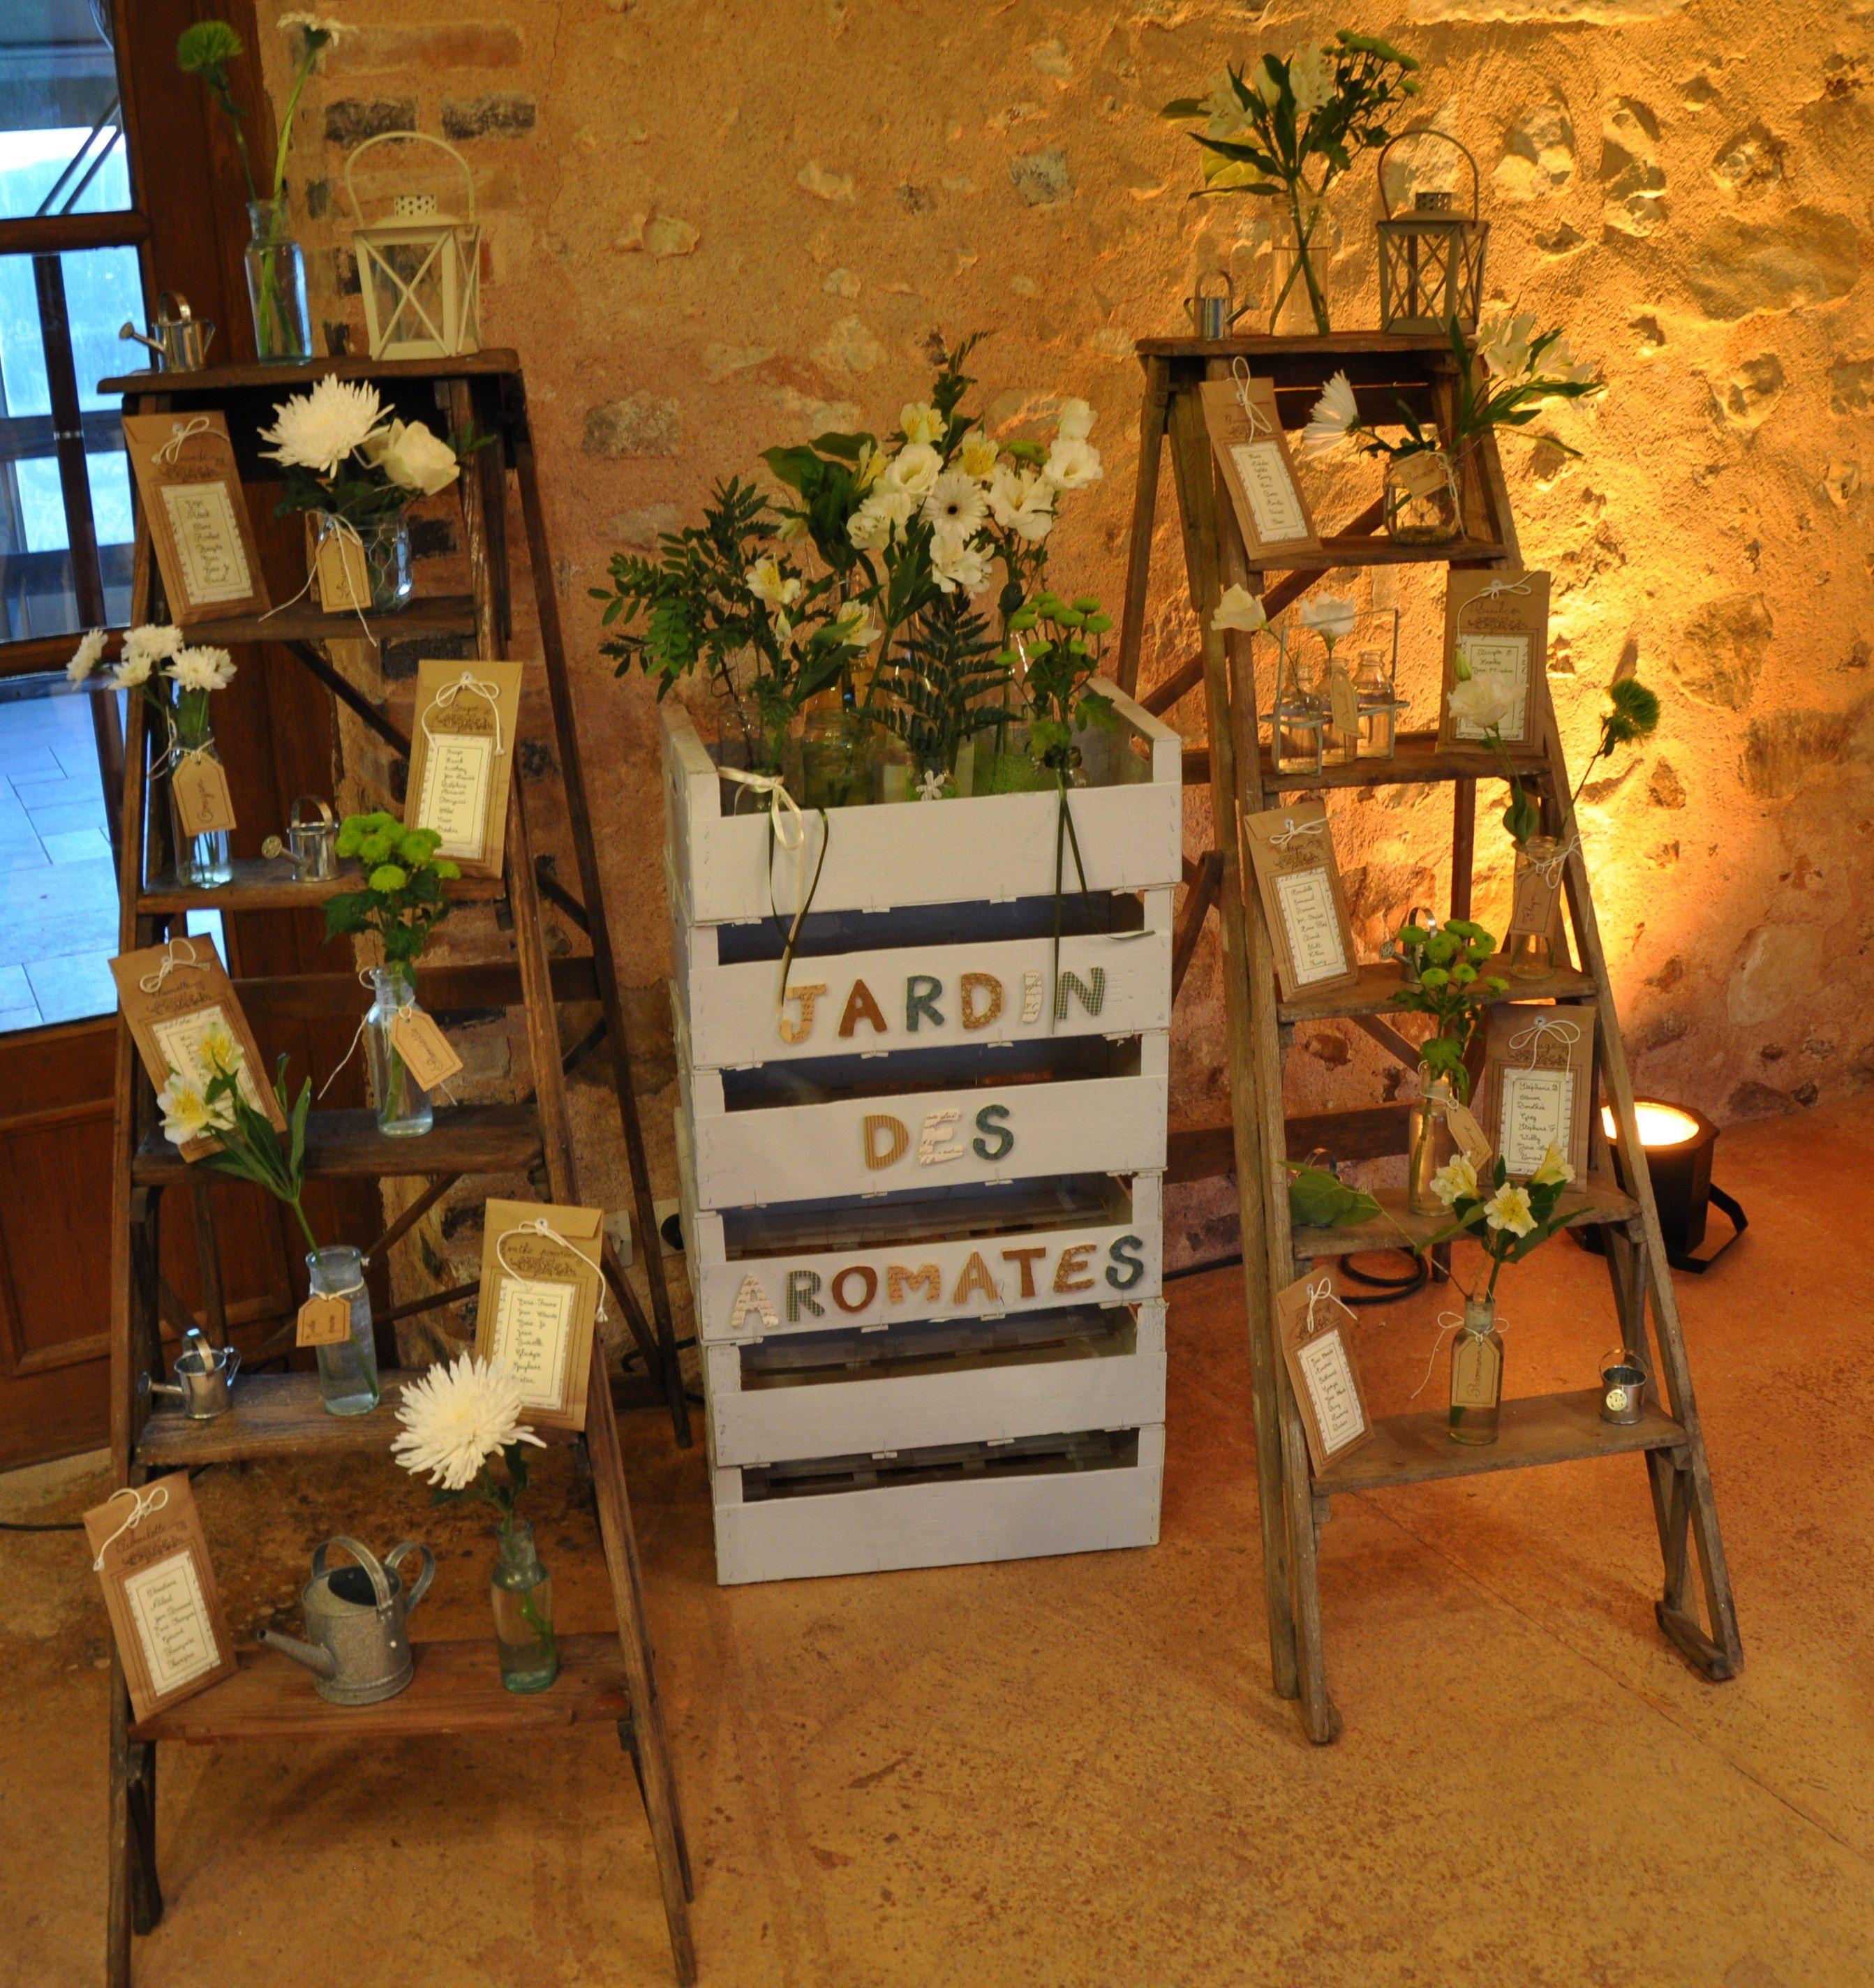 Escabeau plan de table mariage chaque table a un nom d - Idee nom table mariage ...